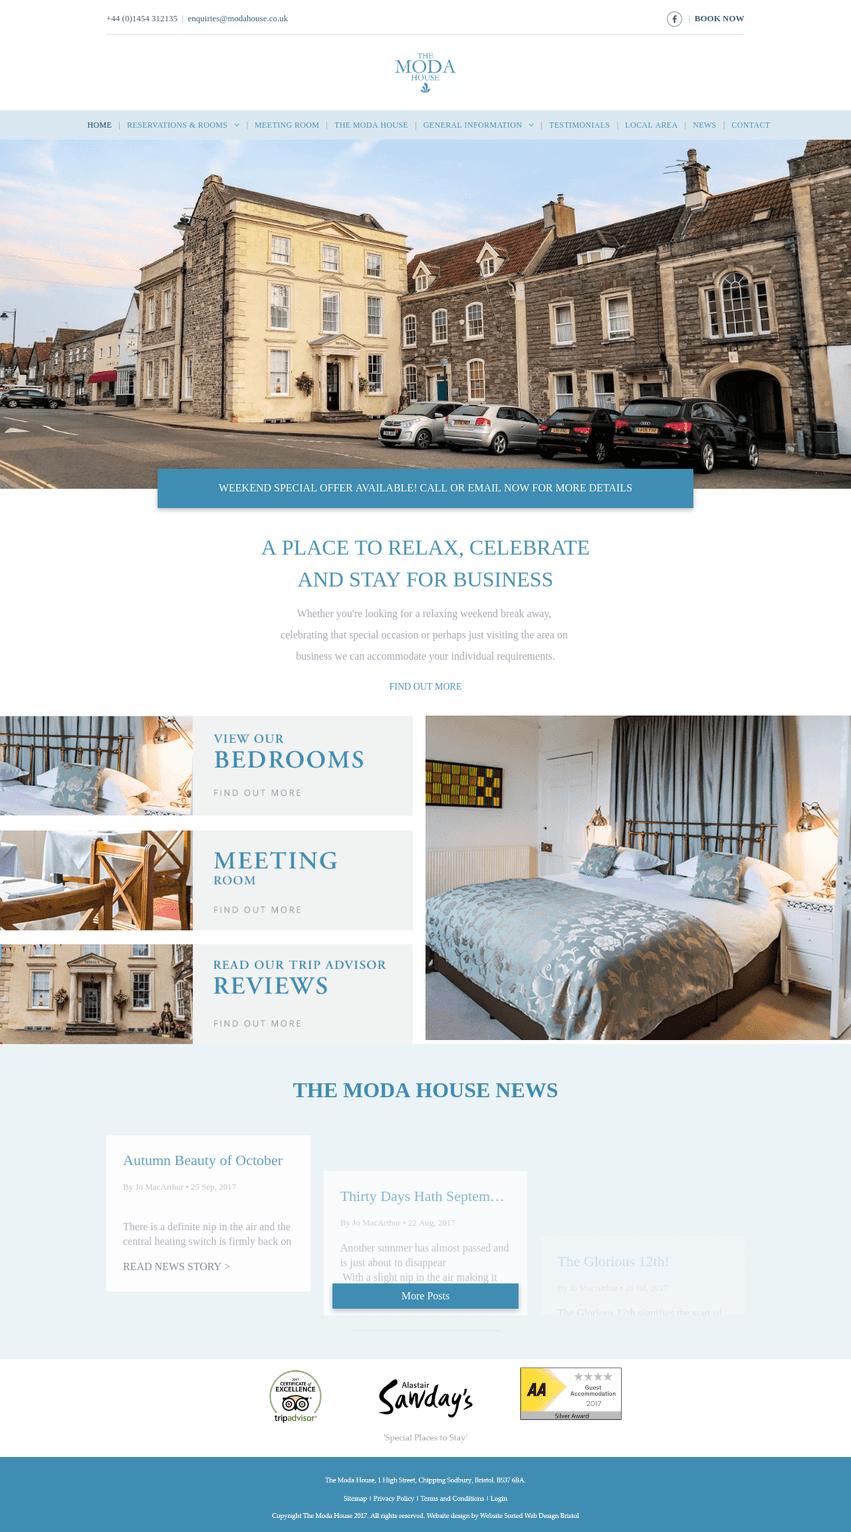 Website Sorted - Web Design Bristol & Cardiff | SEO Bristol